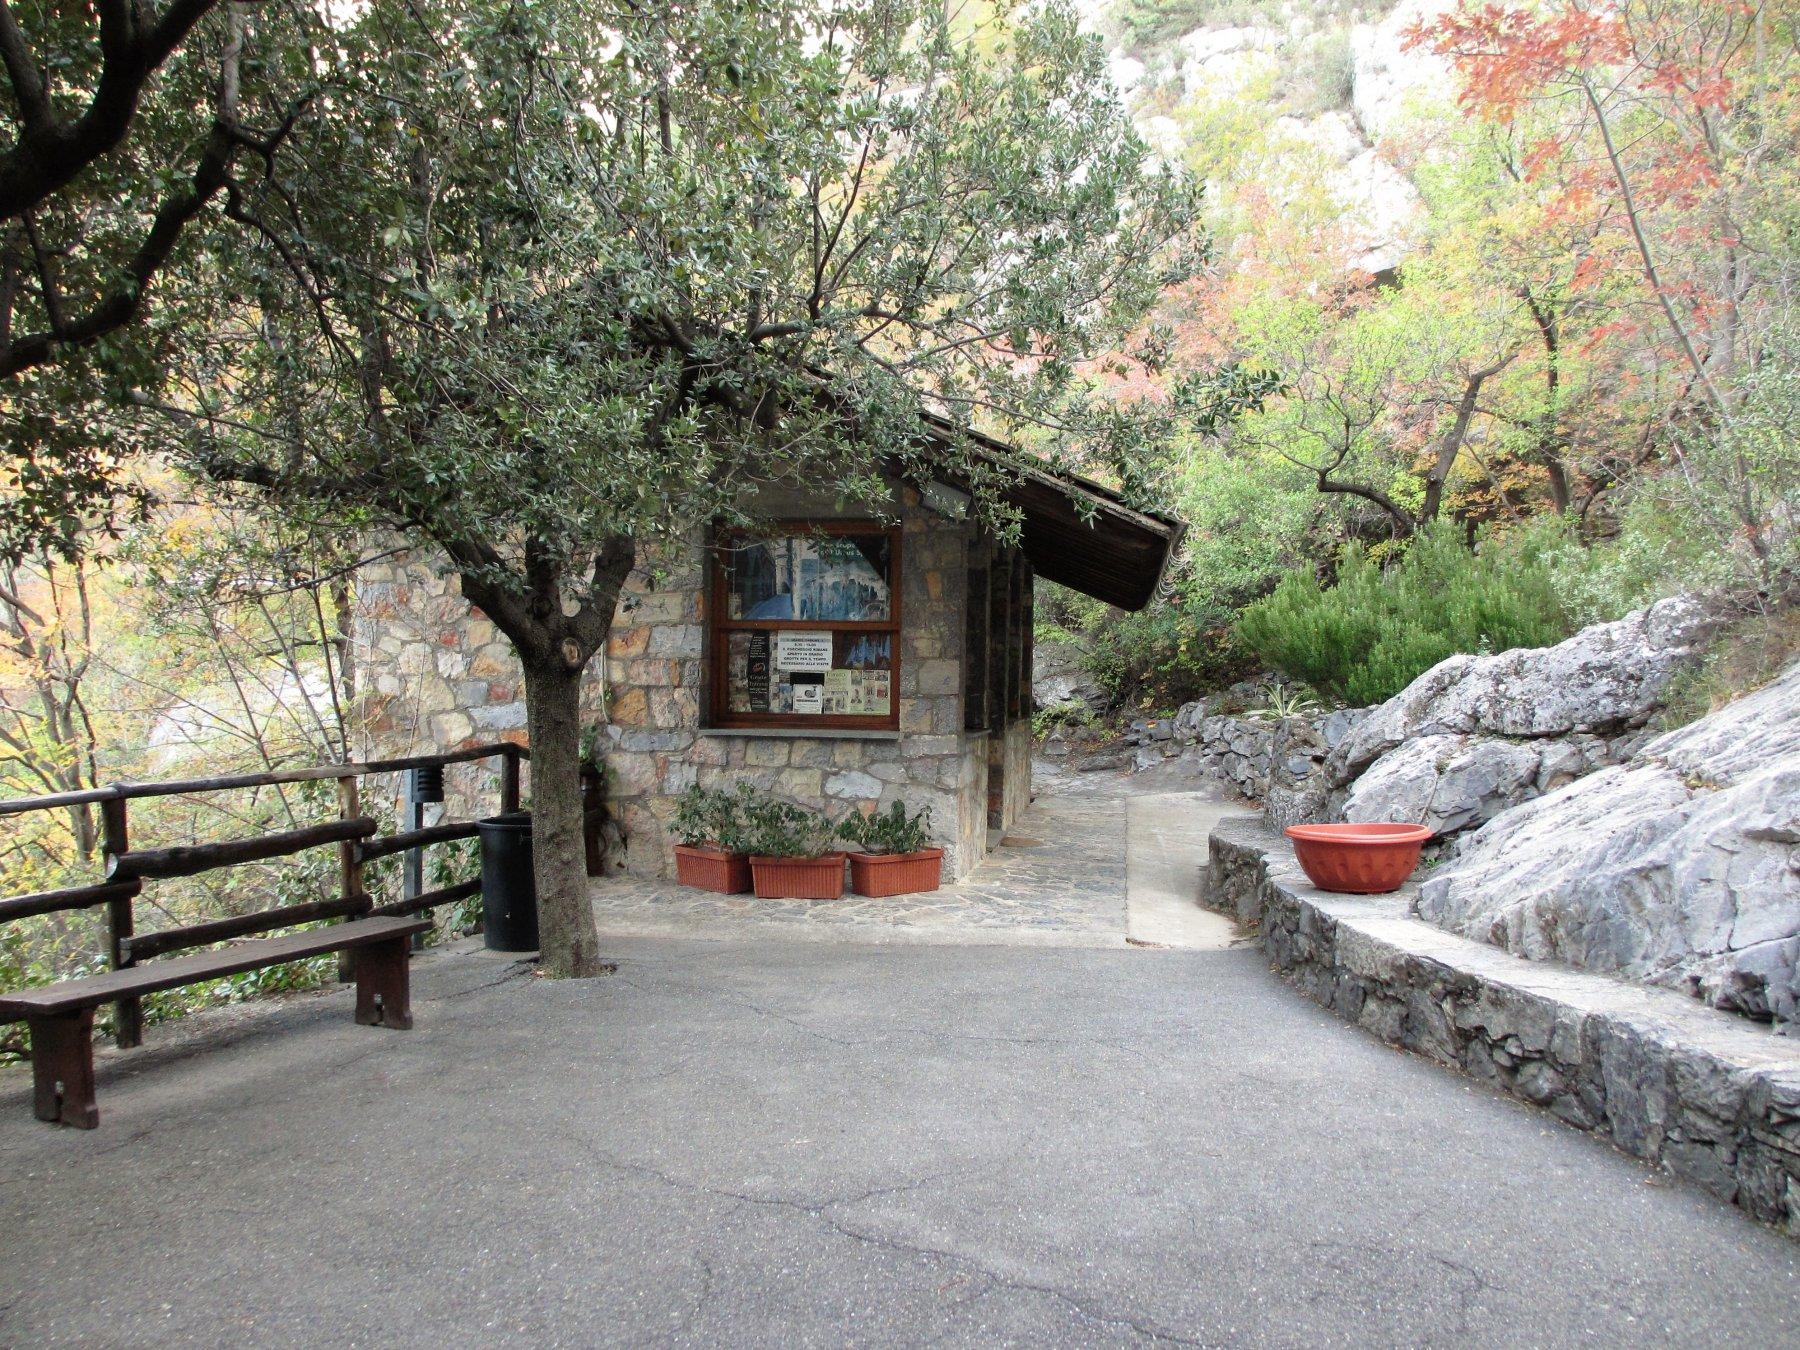 Casotto delle guide piazzale ingresso grotte